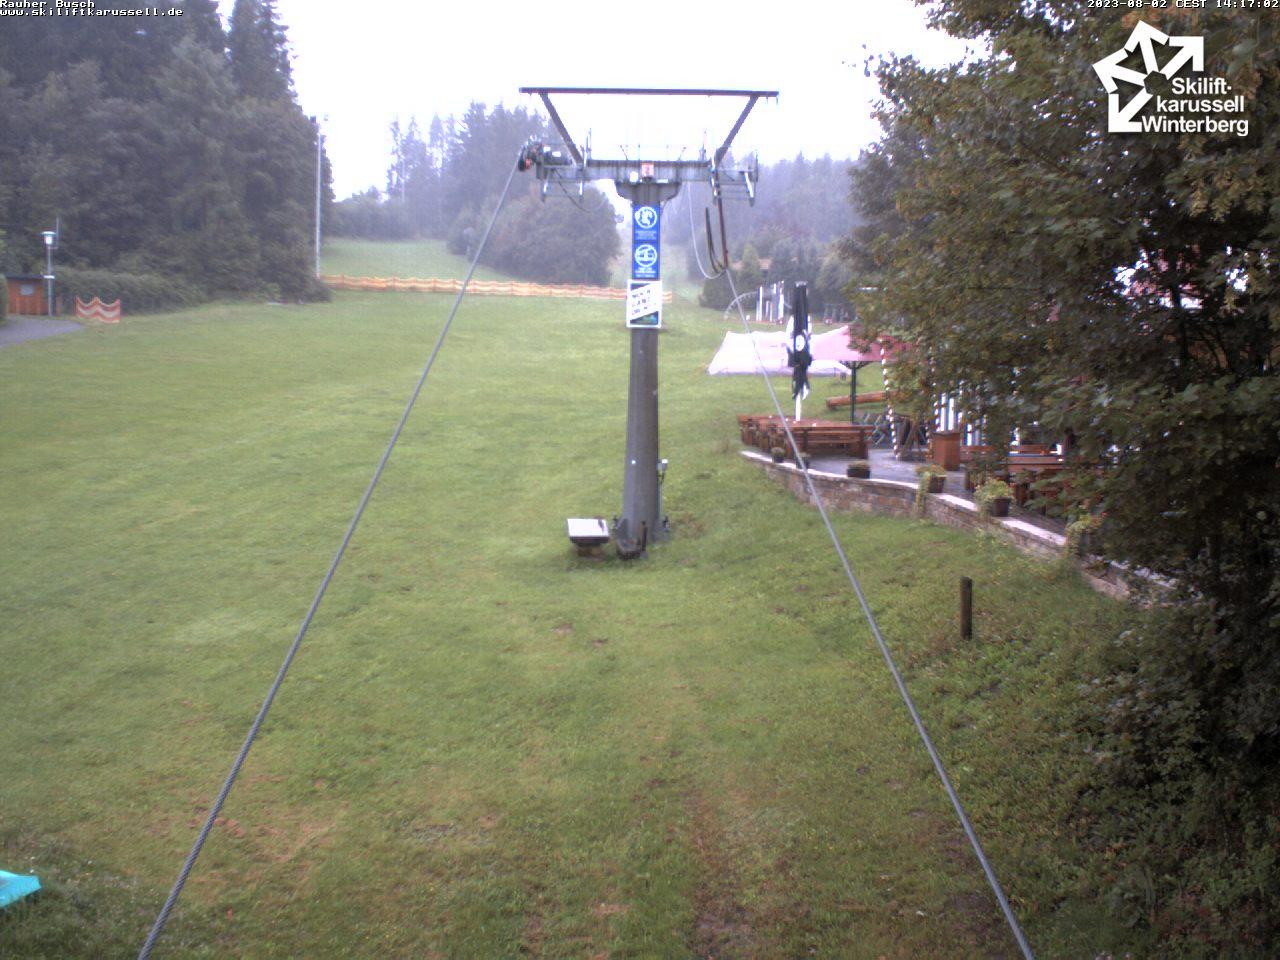 Skiliftkarussell Winterberg - Webcam 4